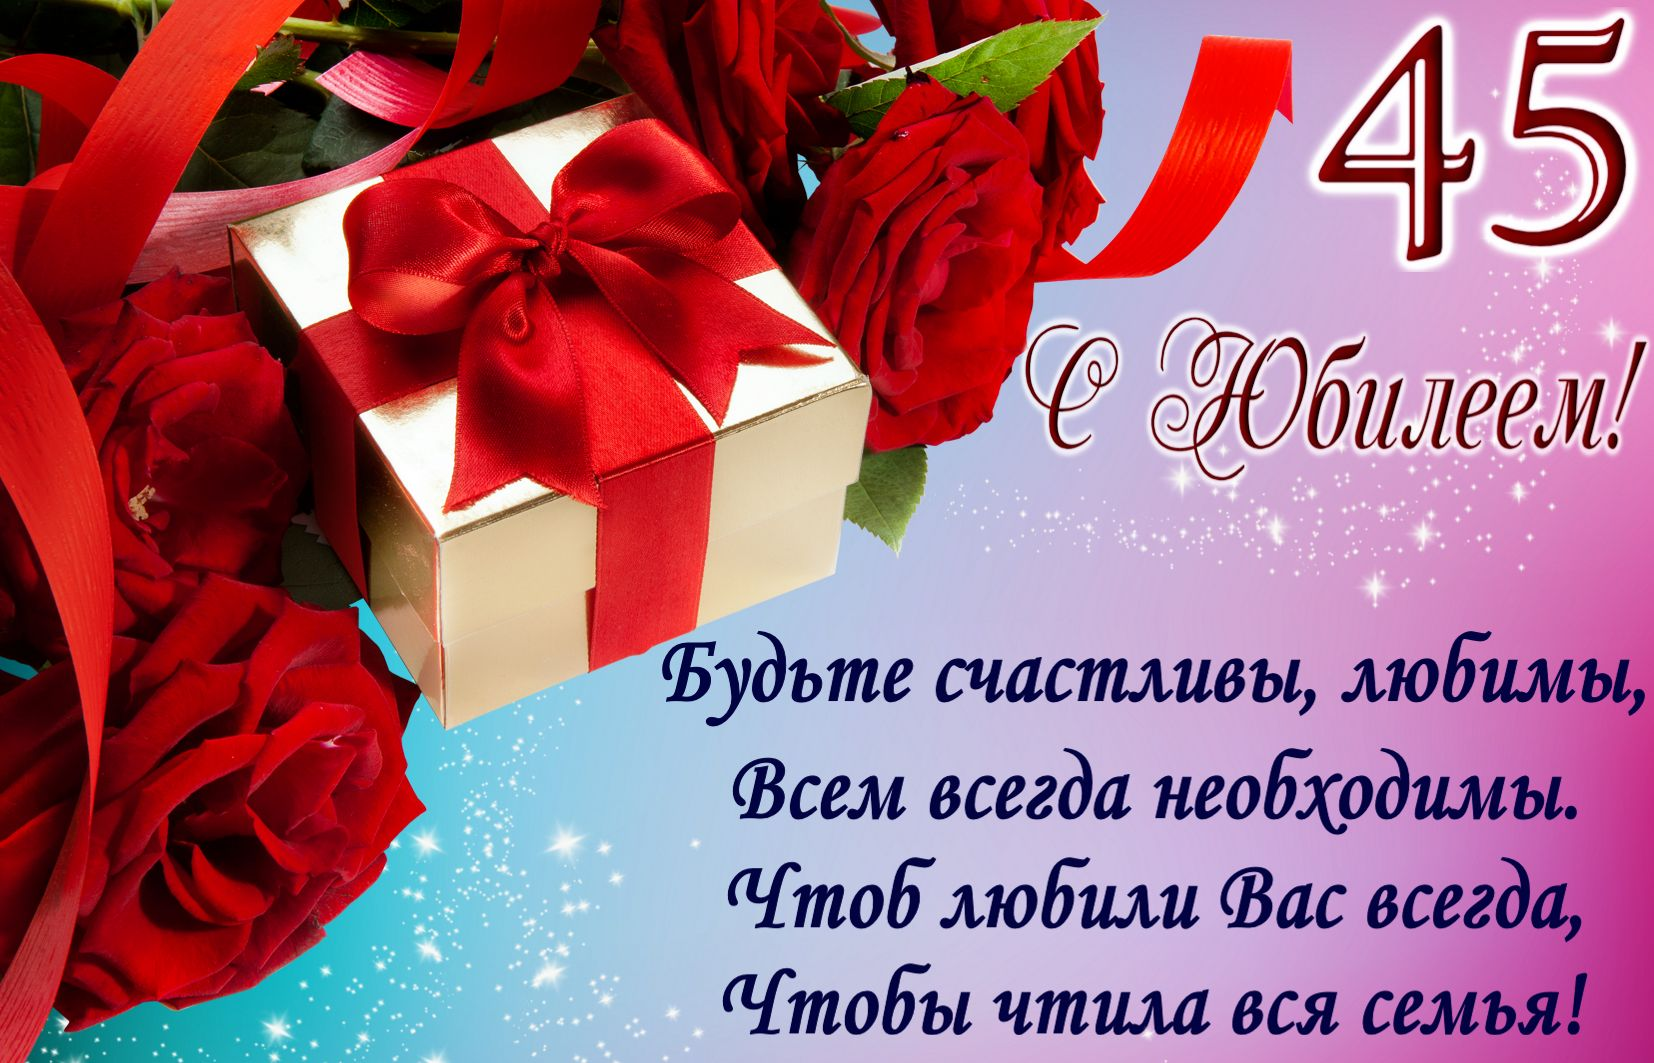 Поздравления на юбилей подарок от нас